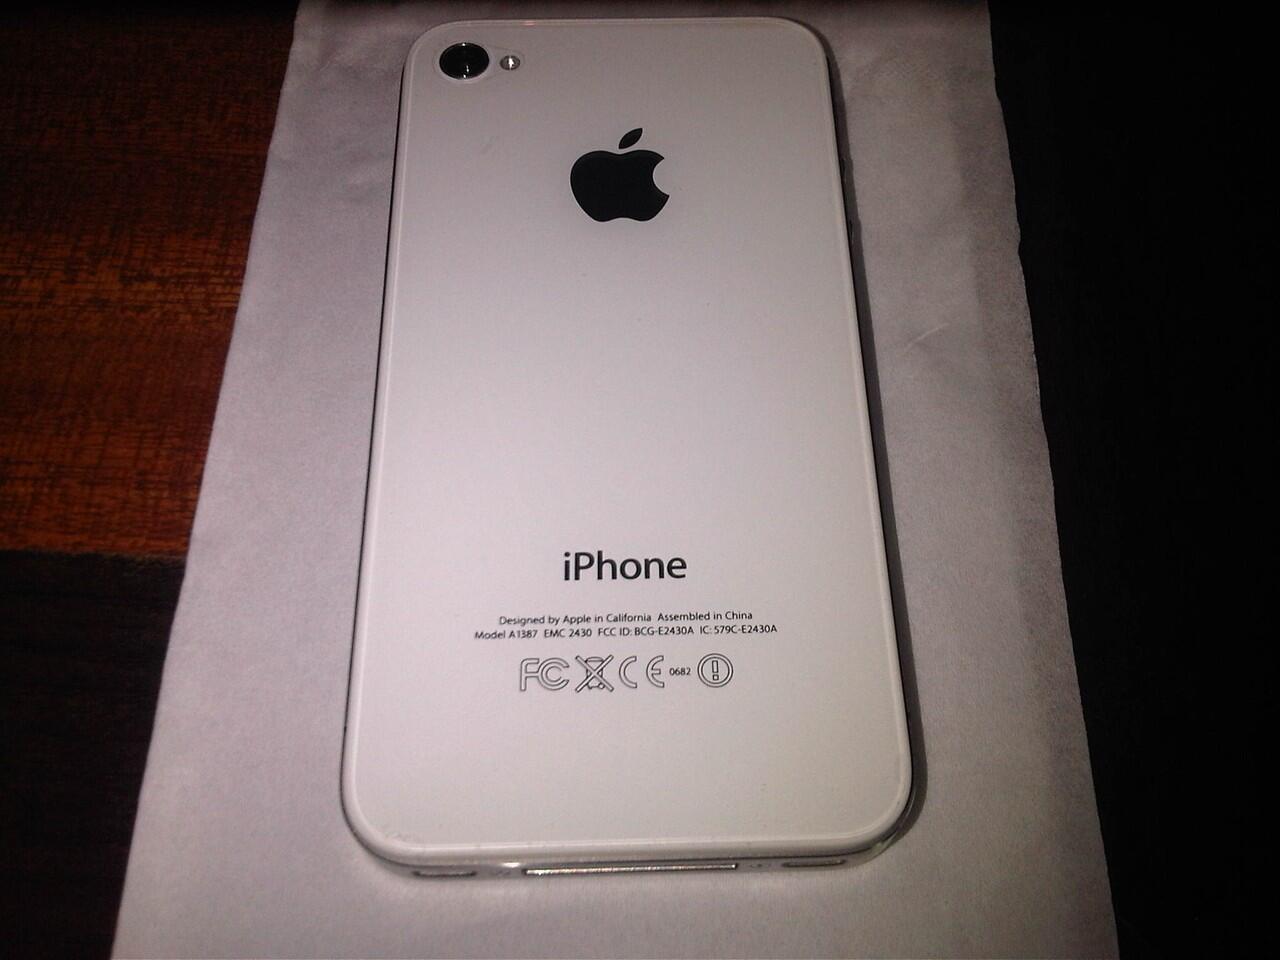 Wts: Iphone 4s 16Gb medan